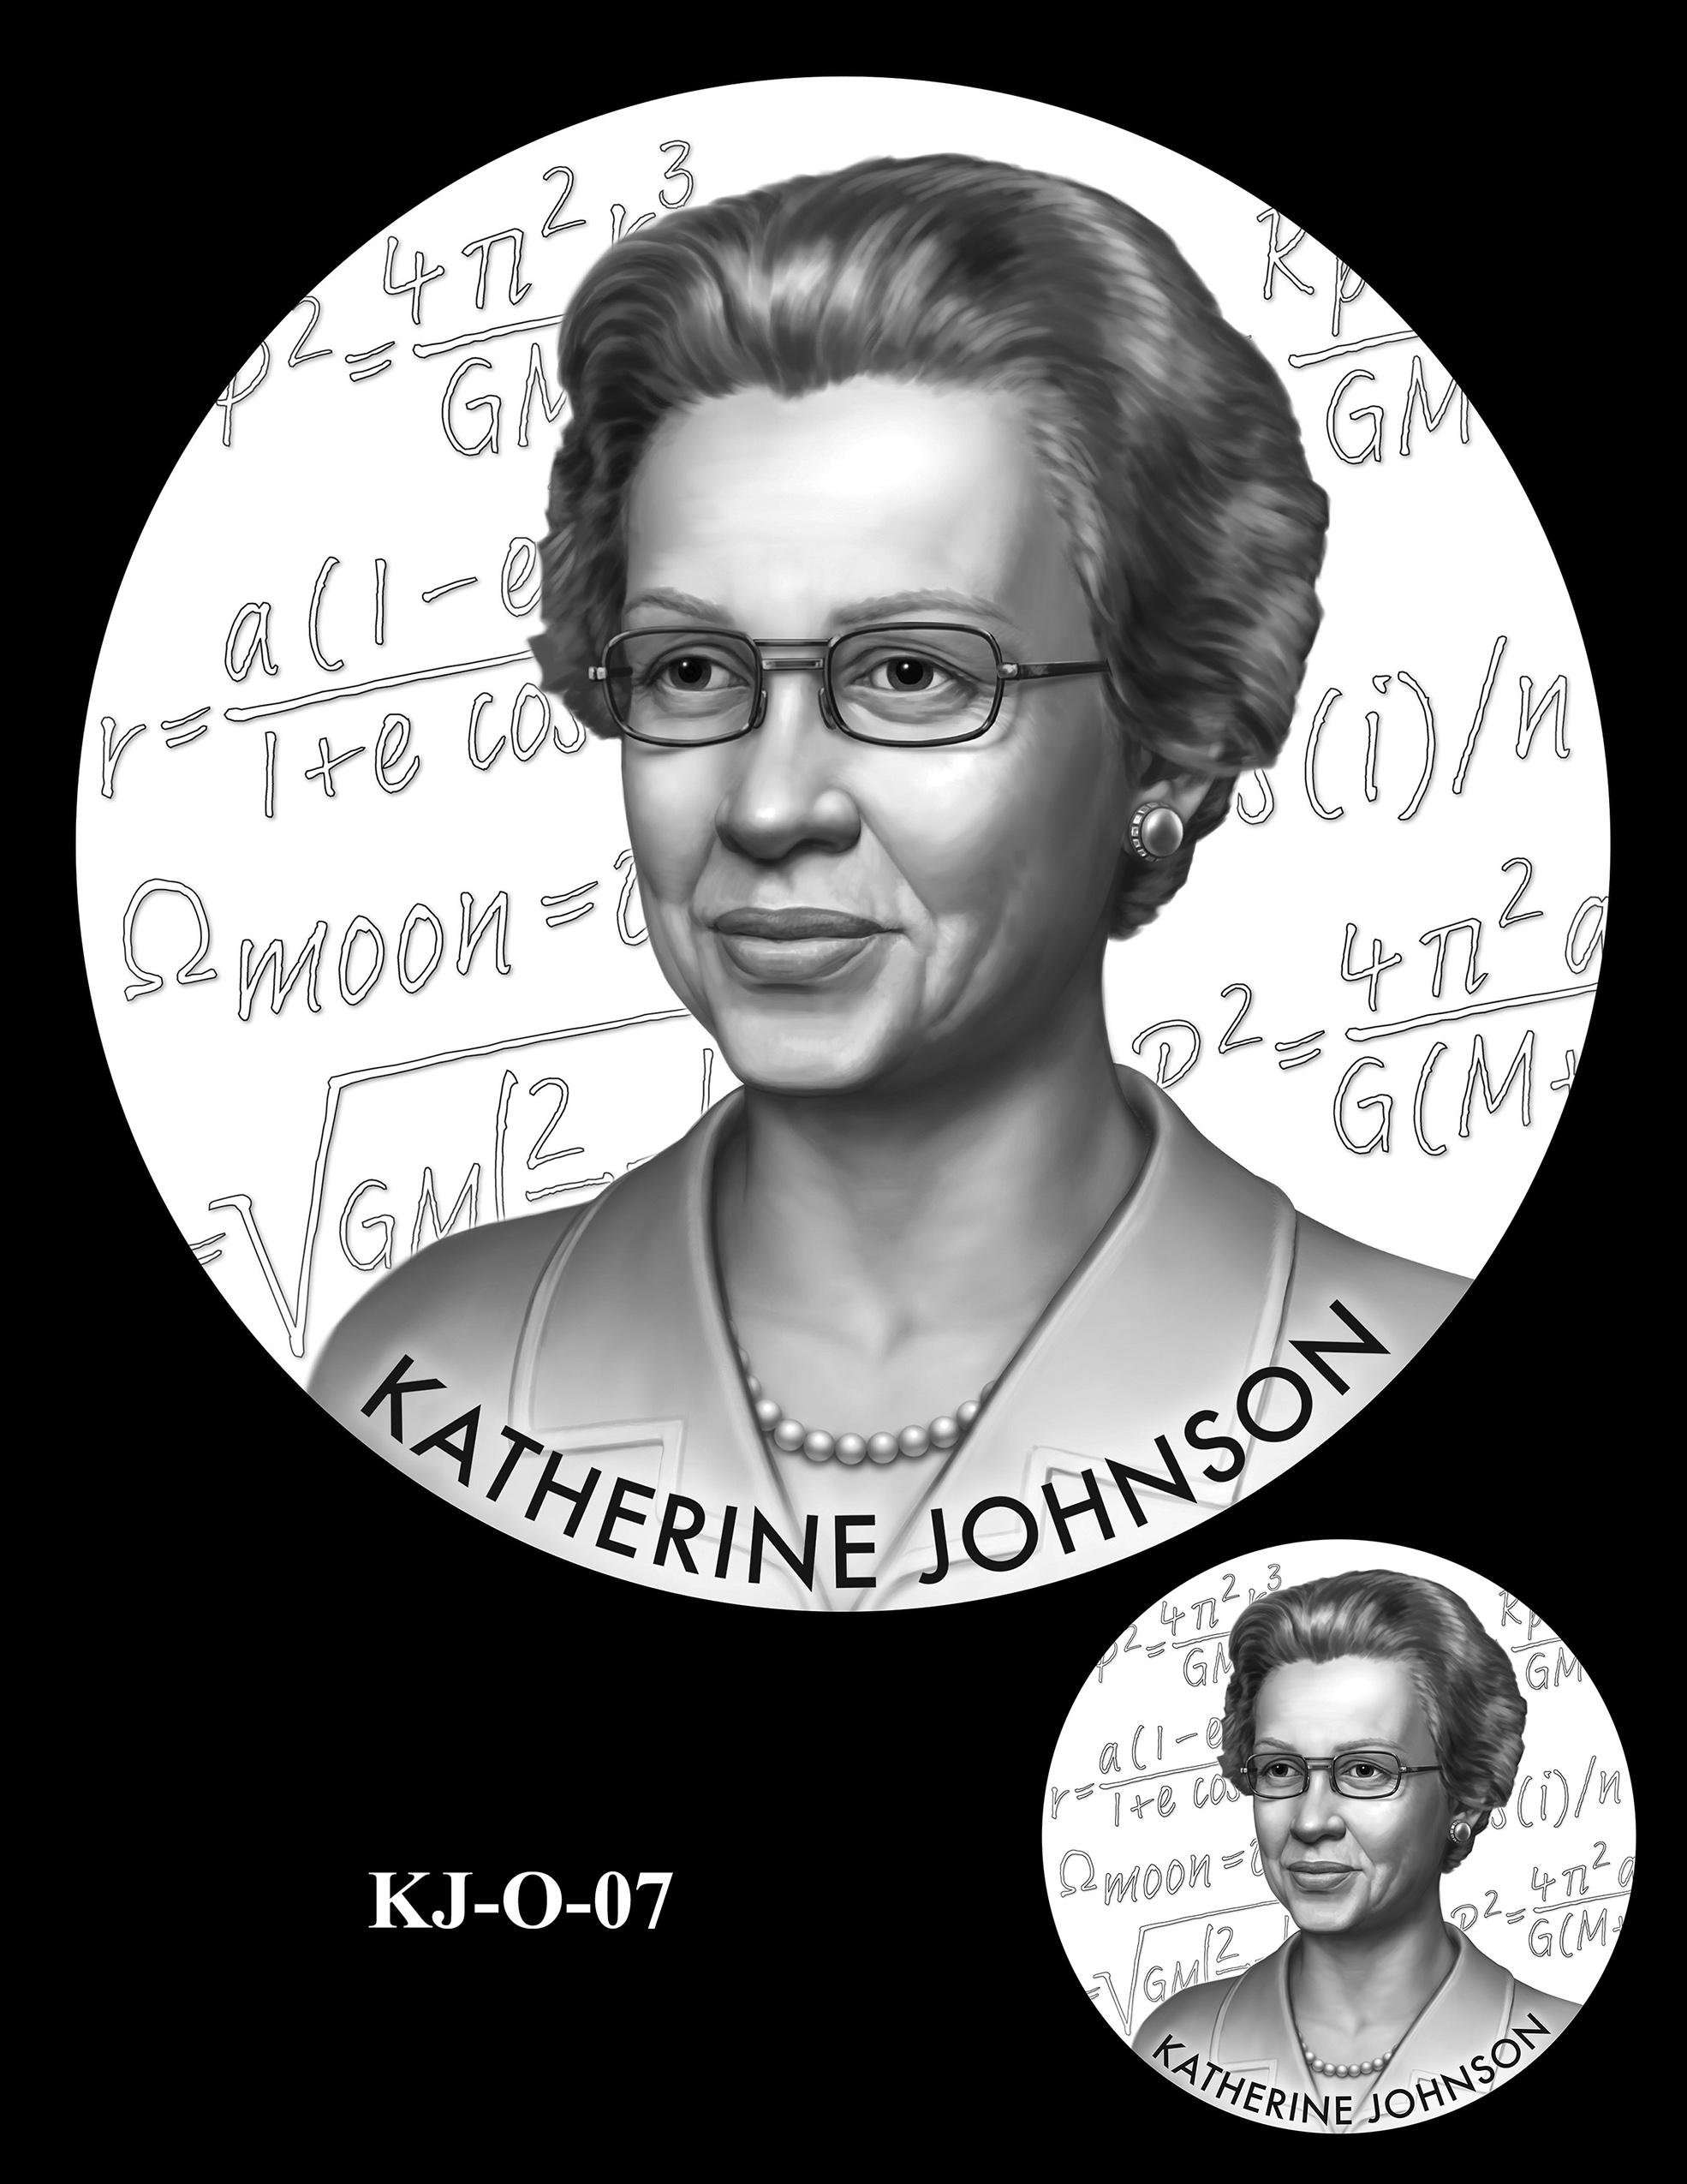 KJ-O-07 -- Katherine Johnson Congressional Gold Medal